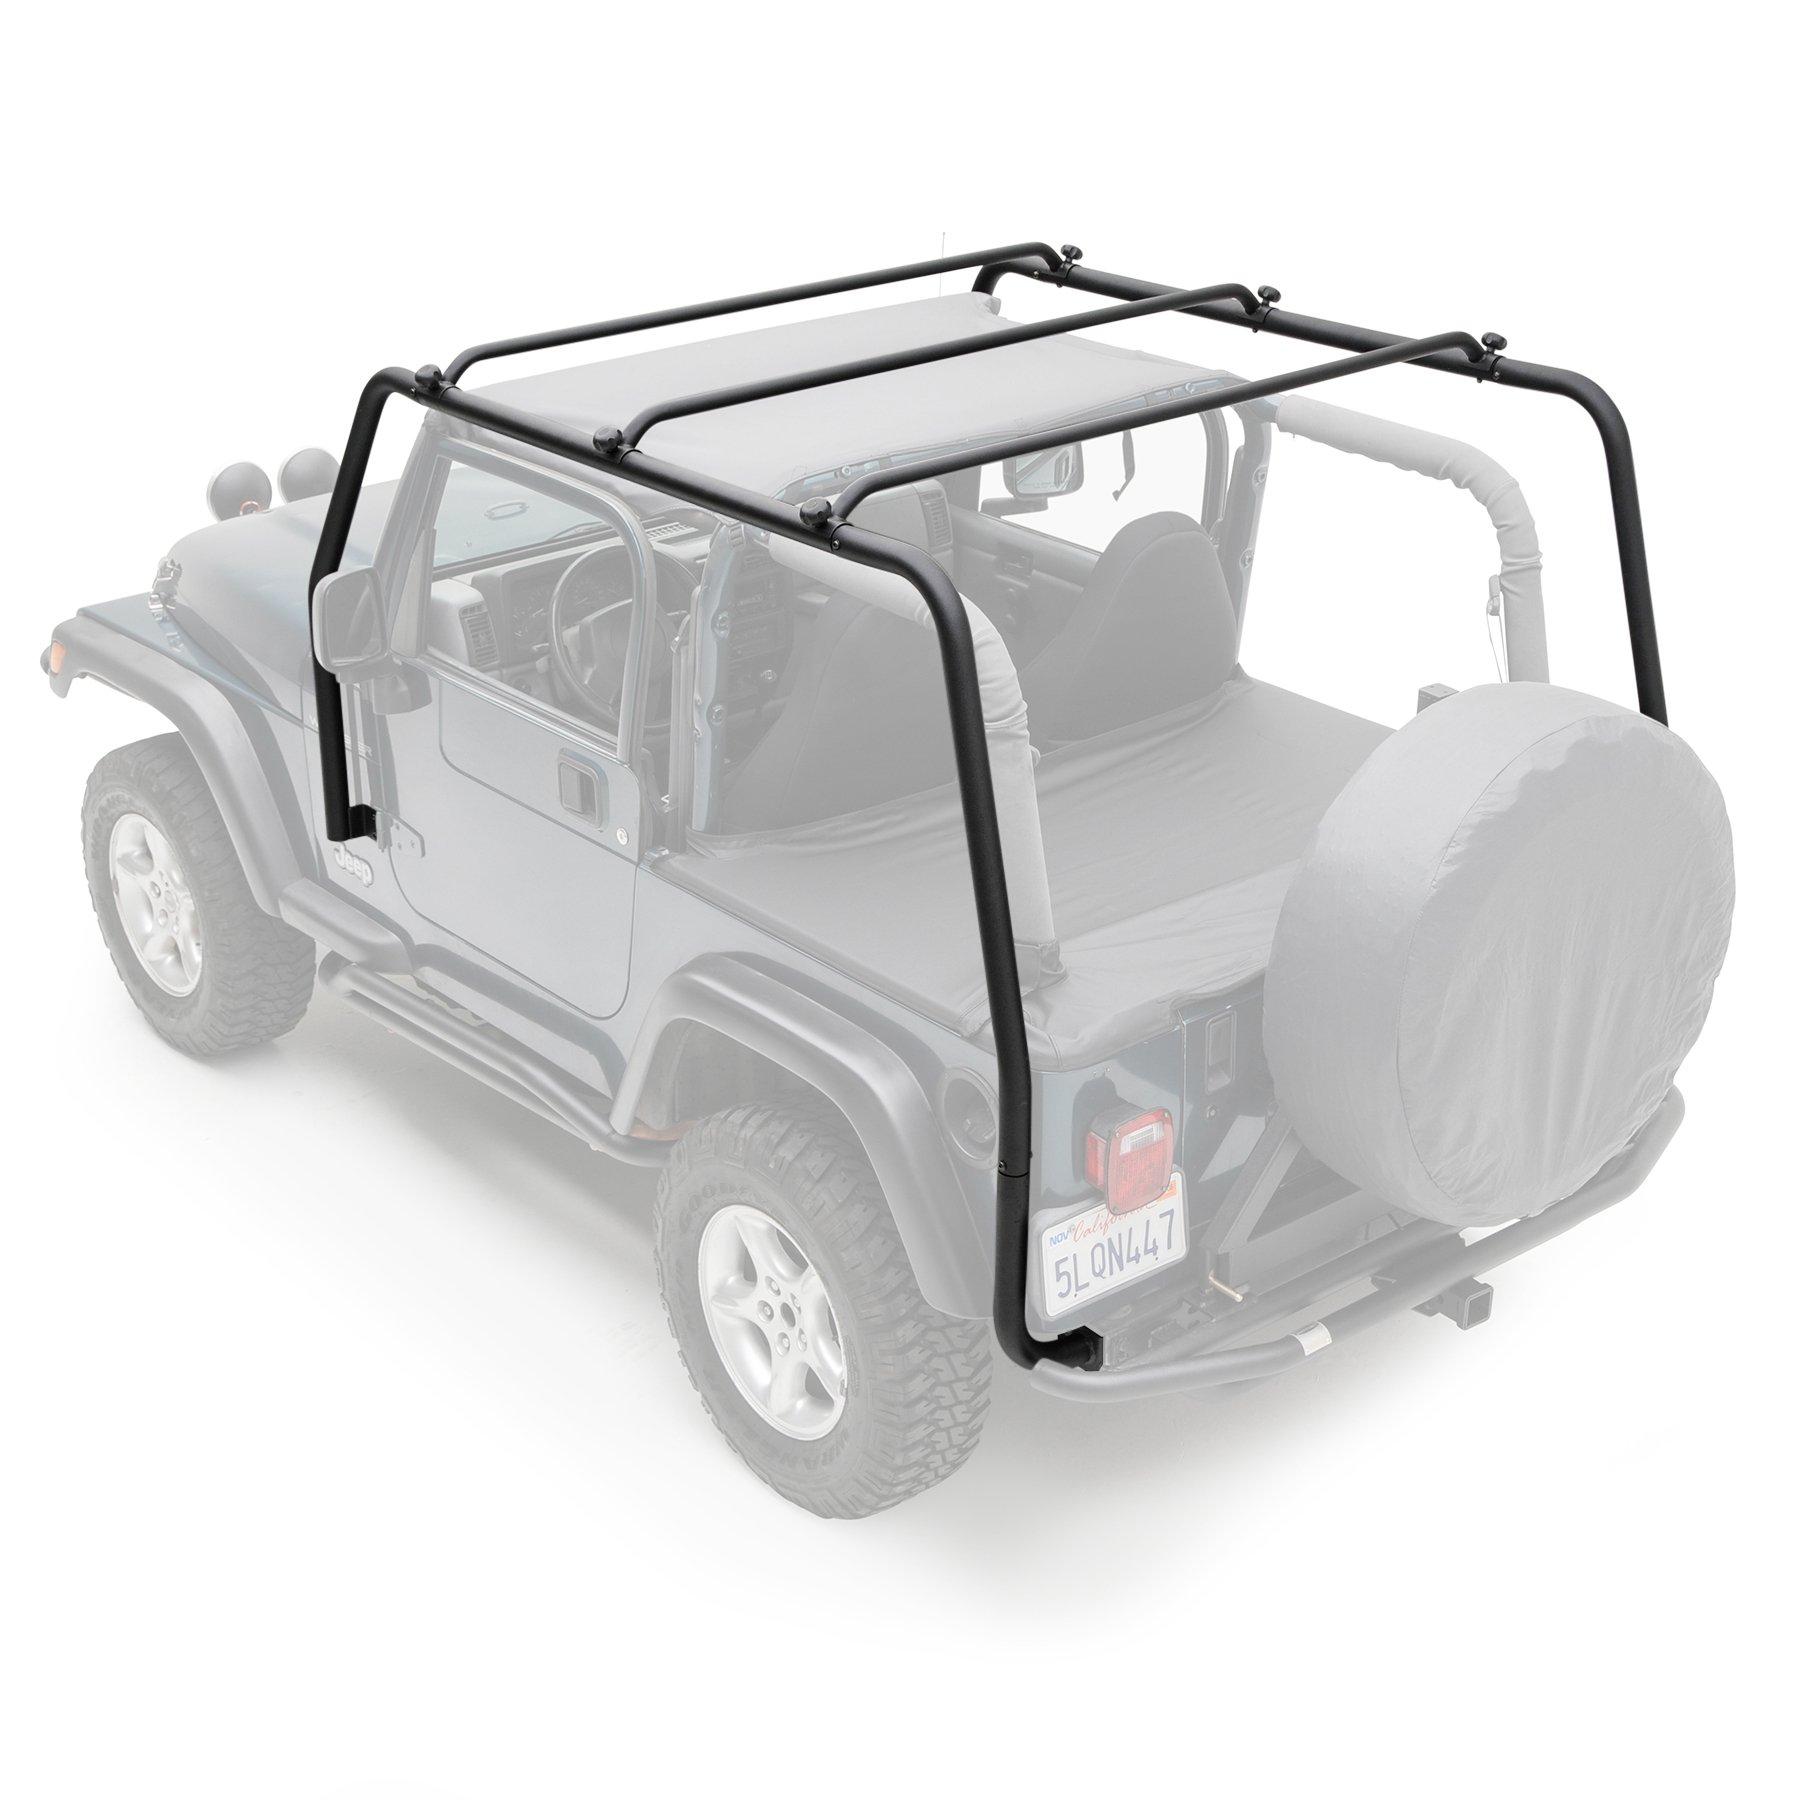 Roof Racks for Jeep Wrangler: Amazon.com